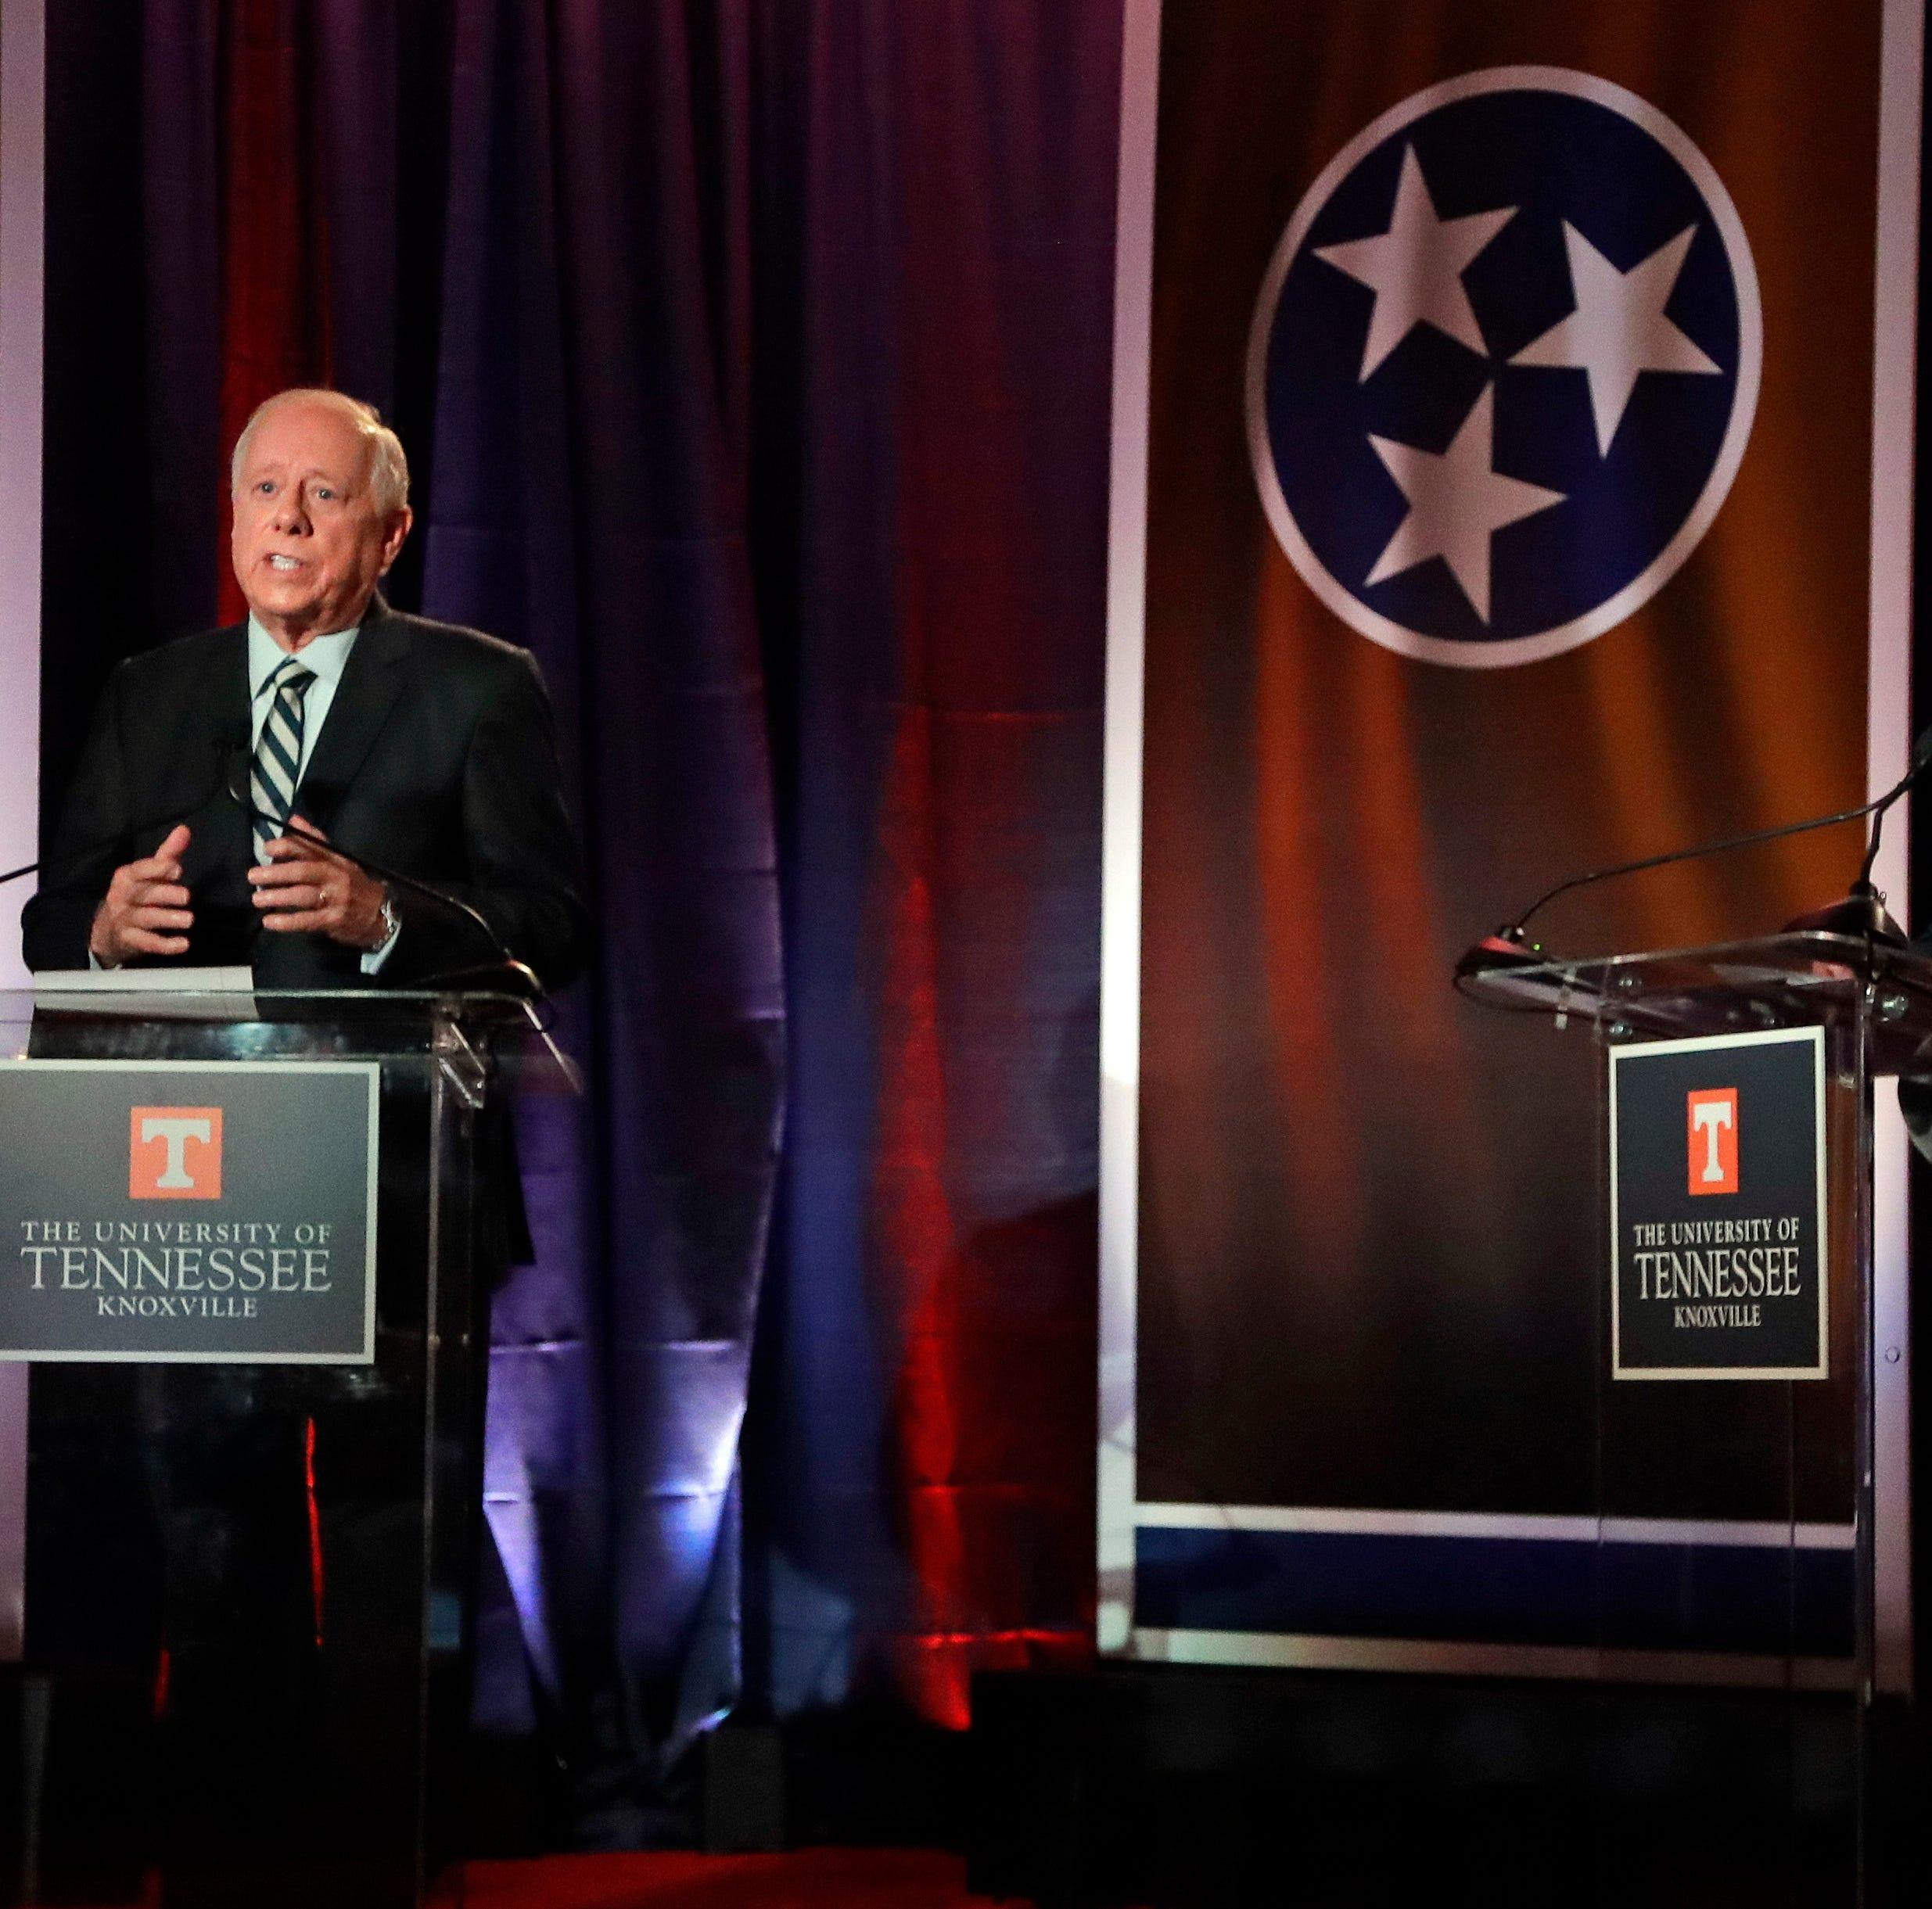 Attacks, Hillary Clinton and #MeToo: 3 takeaways from the Blackburn, Bredesen US Senate debate